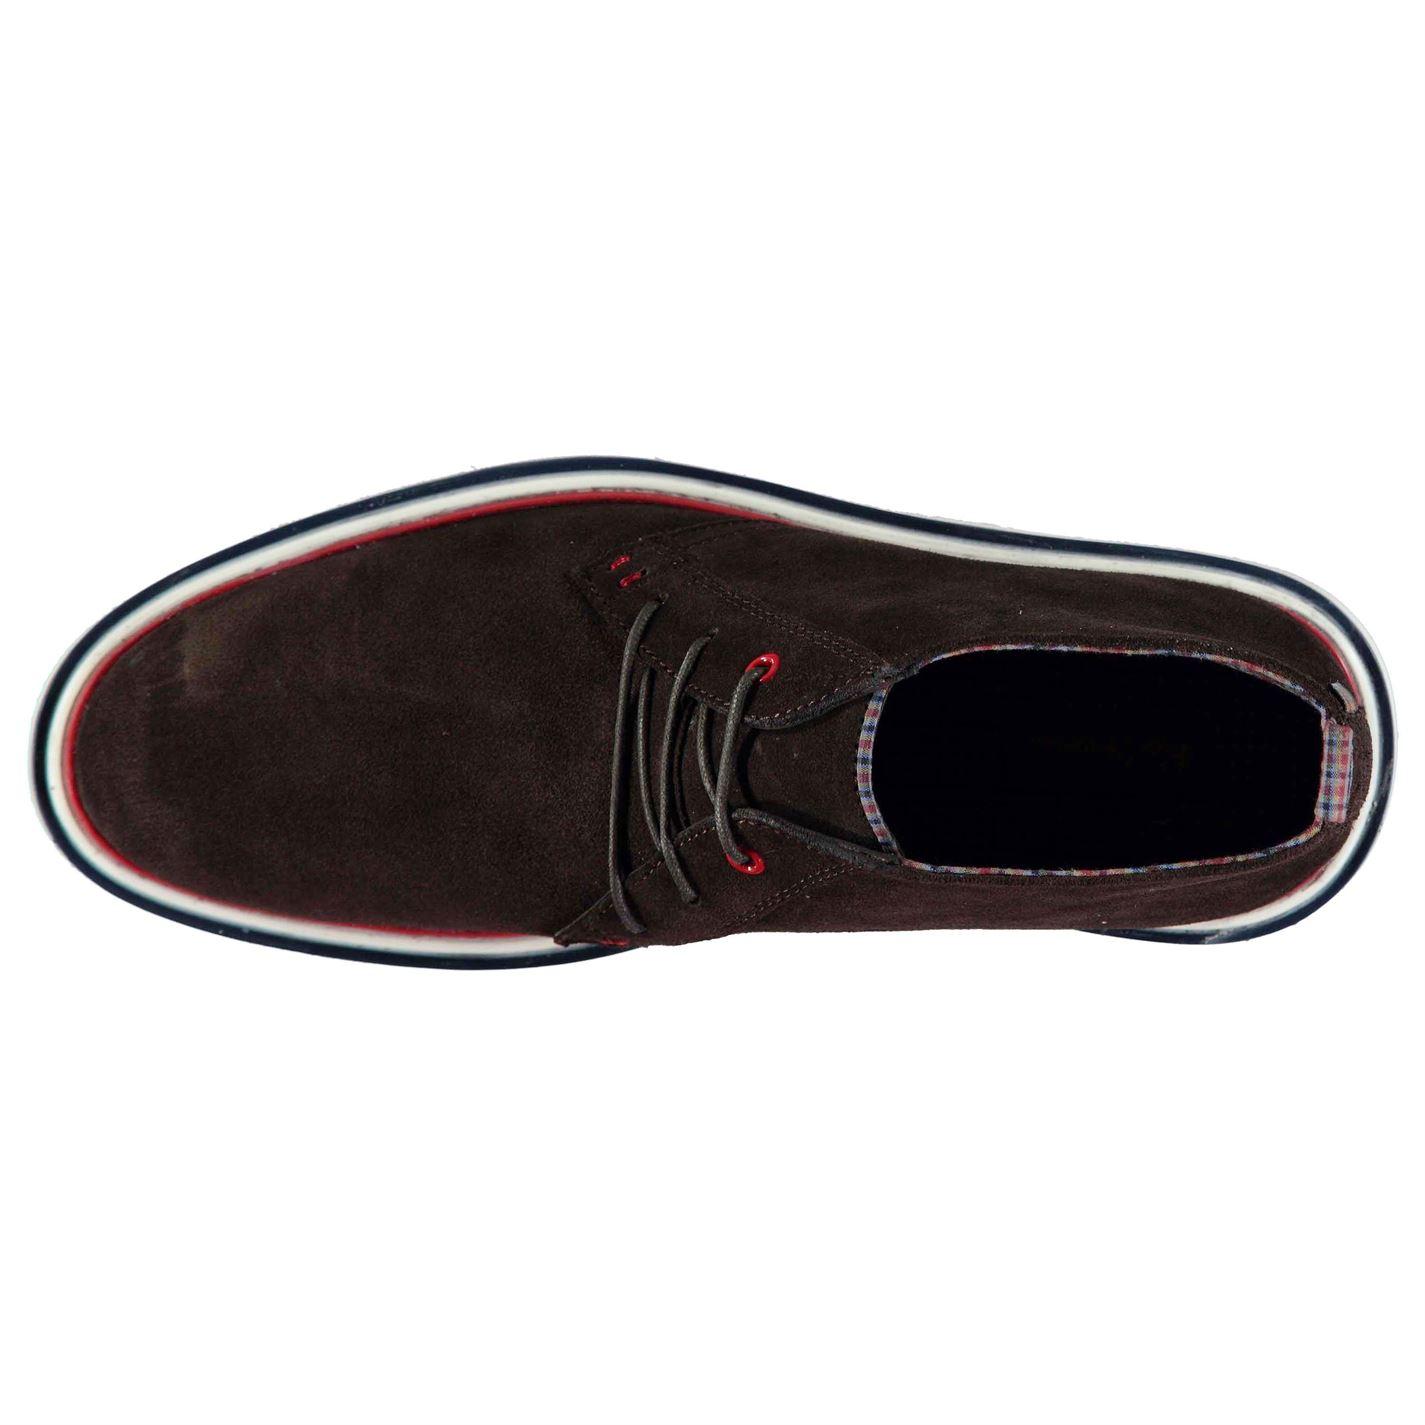 Chaussures Lacets Chaussures Ben Brun Chukka Daim Sherman Mens Modernes Gents Bottes Fixs 8a0H8